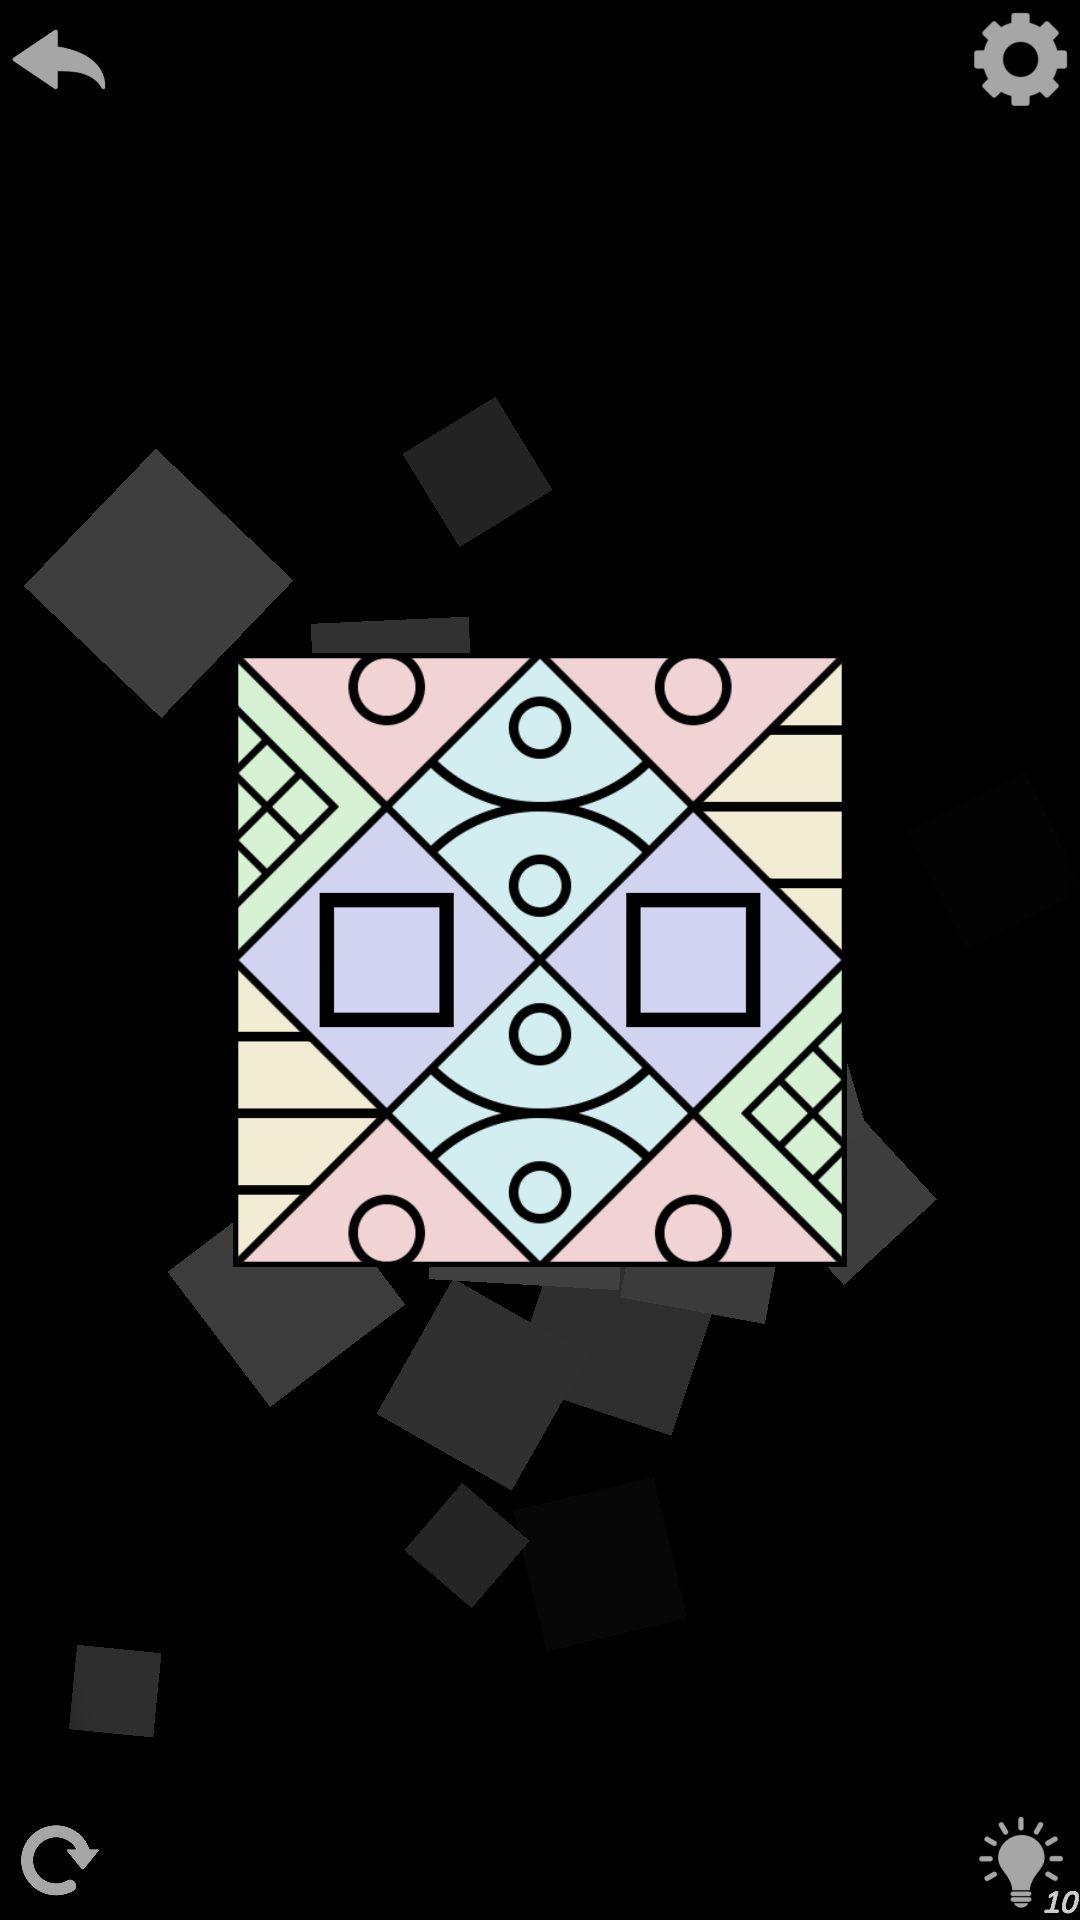 5 уровень AuroraBound - игра с узорами